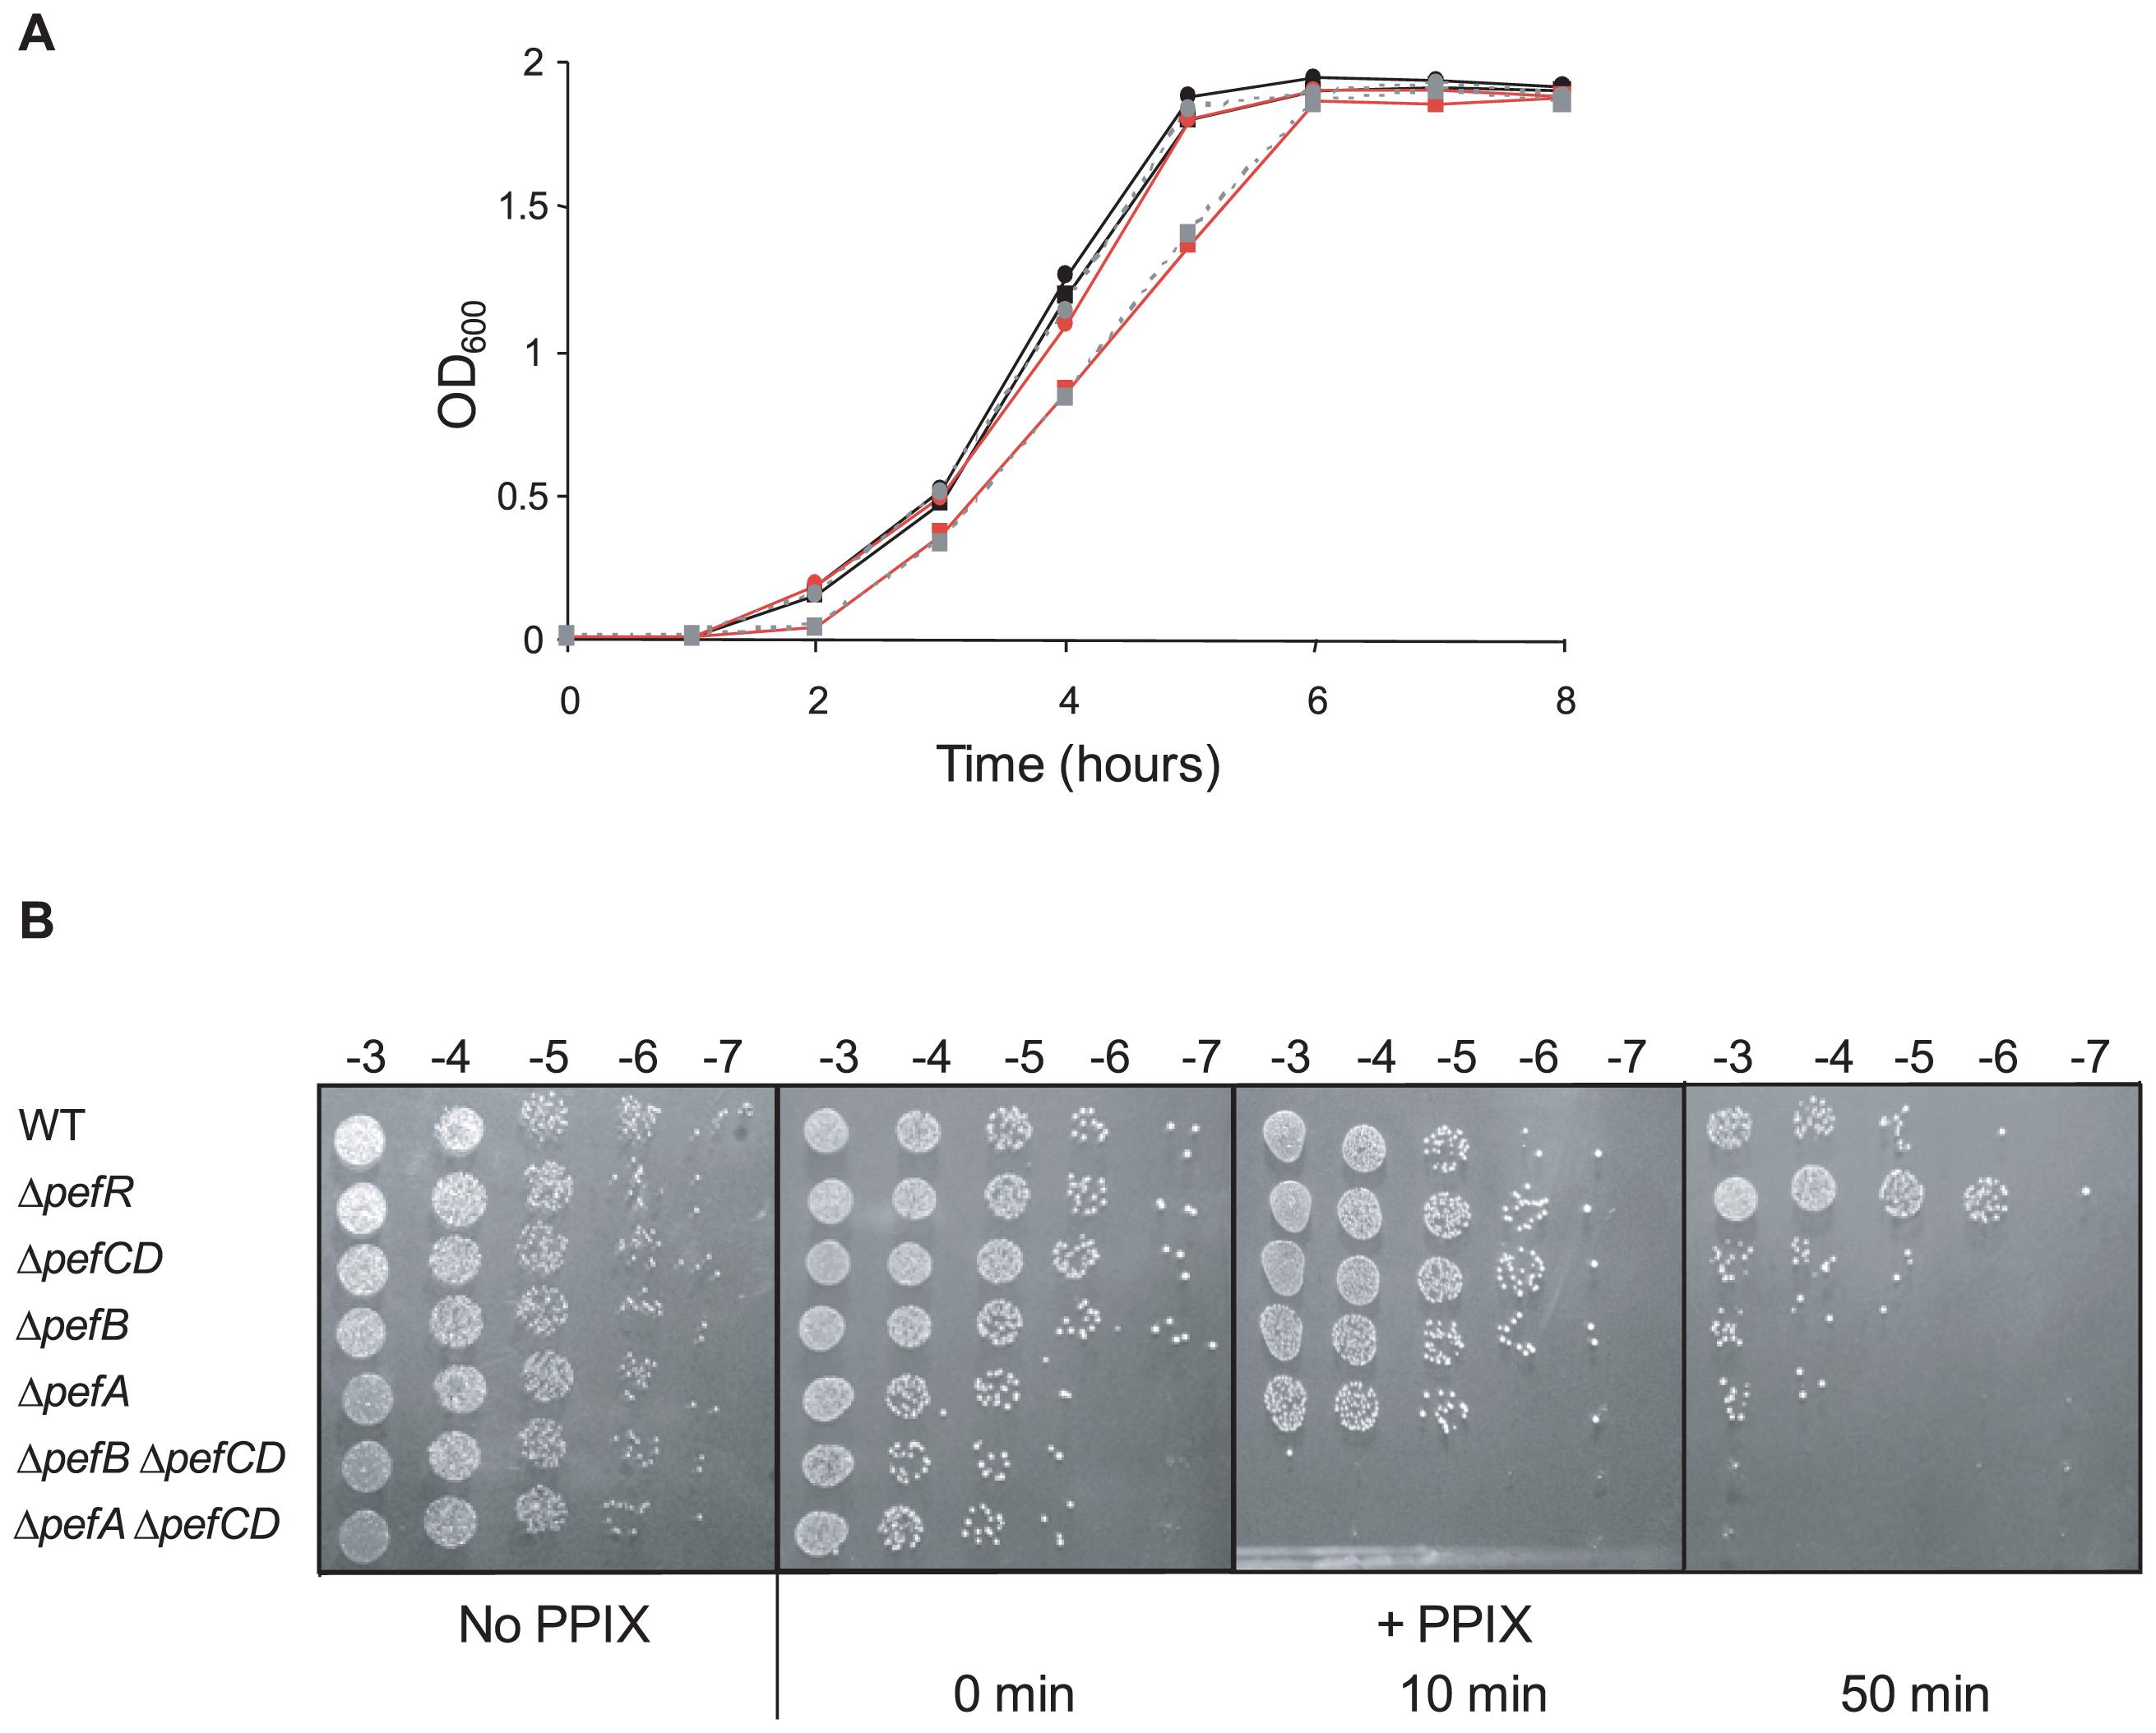 Δ<i>pefAB</i> and Δ<i>pefCD</i> mutants are affected in PPIX and heme sensitivity.